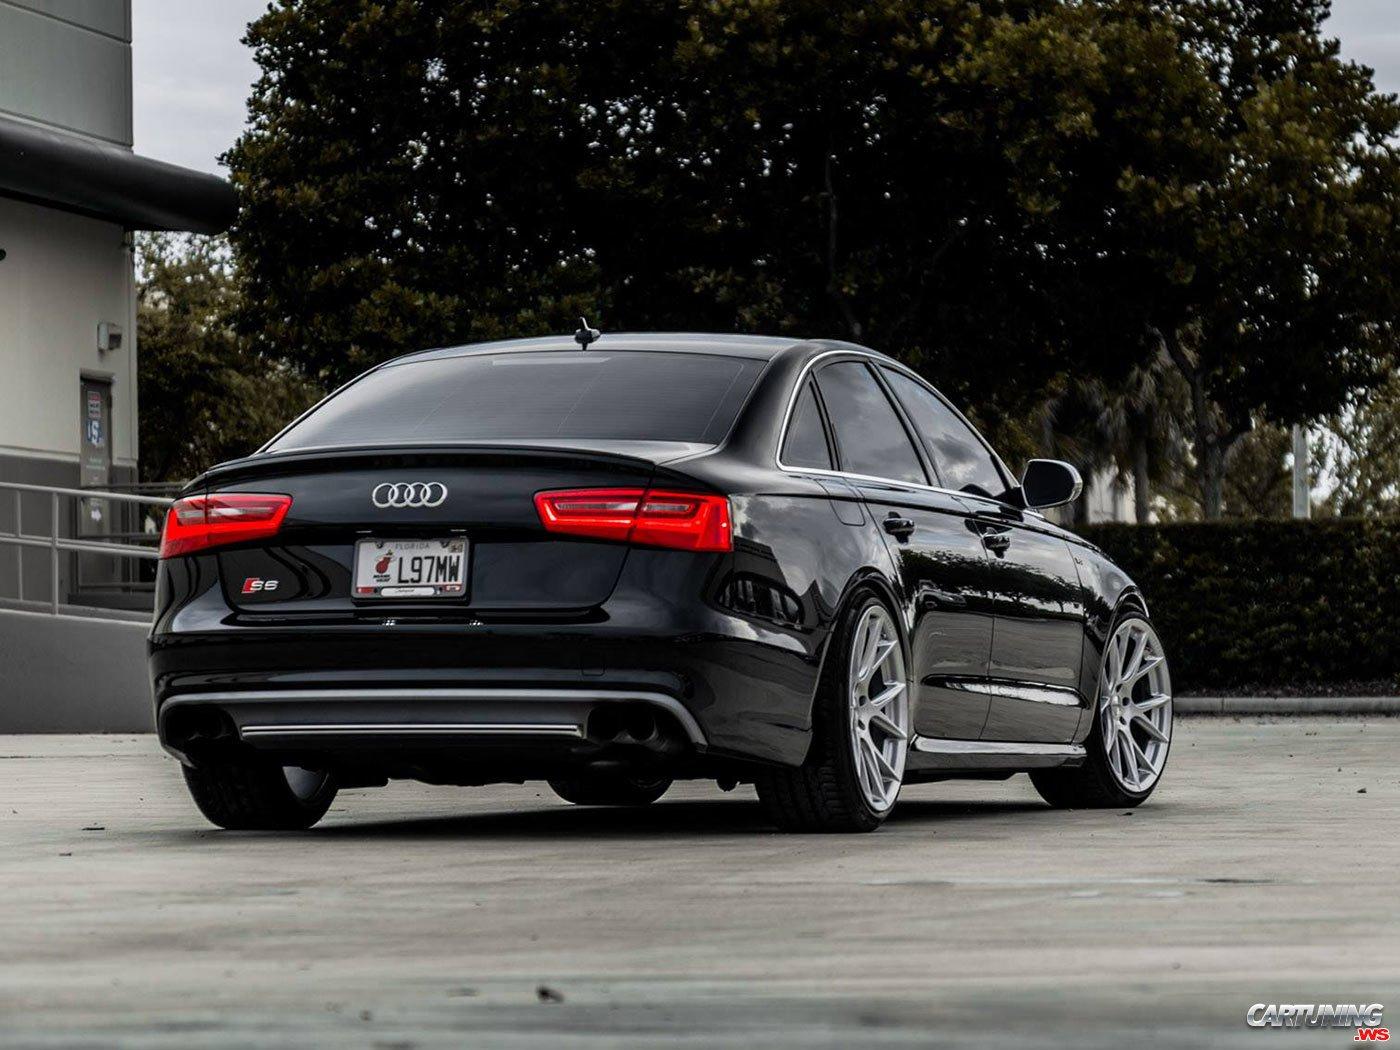 Kelebihan Audi S6 C7 Top Model Tahun Ini